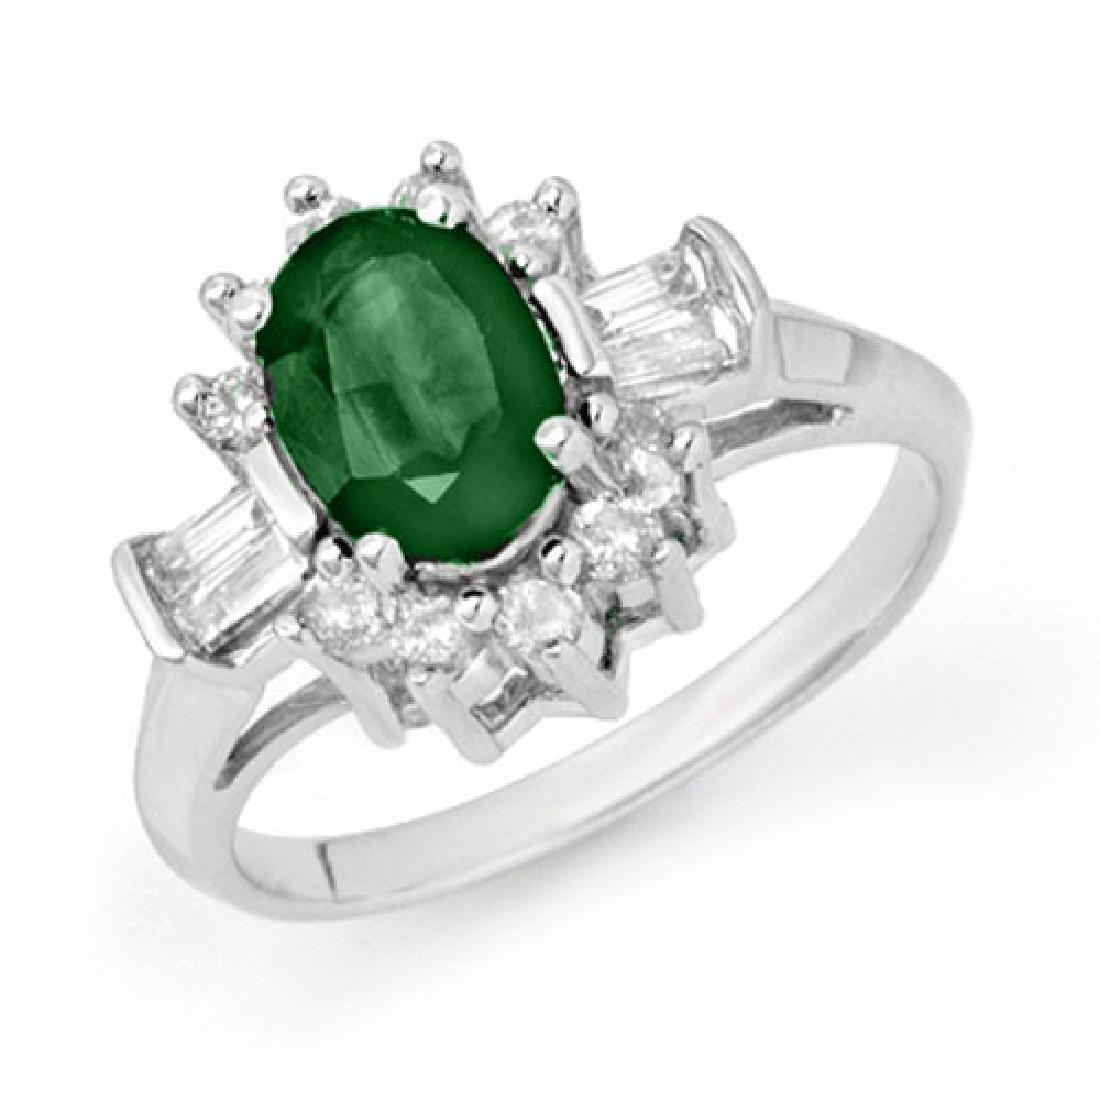 1.74 CTW Emerald & Diamond Ring 10K White Gold